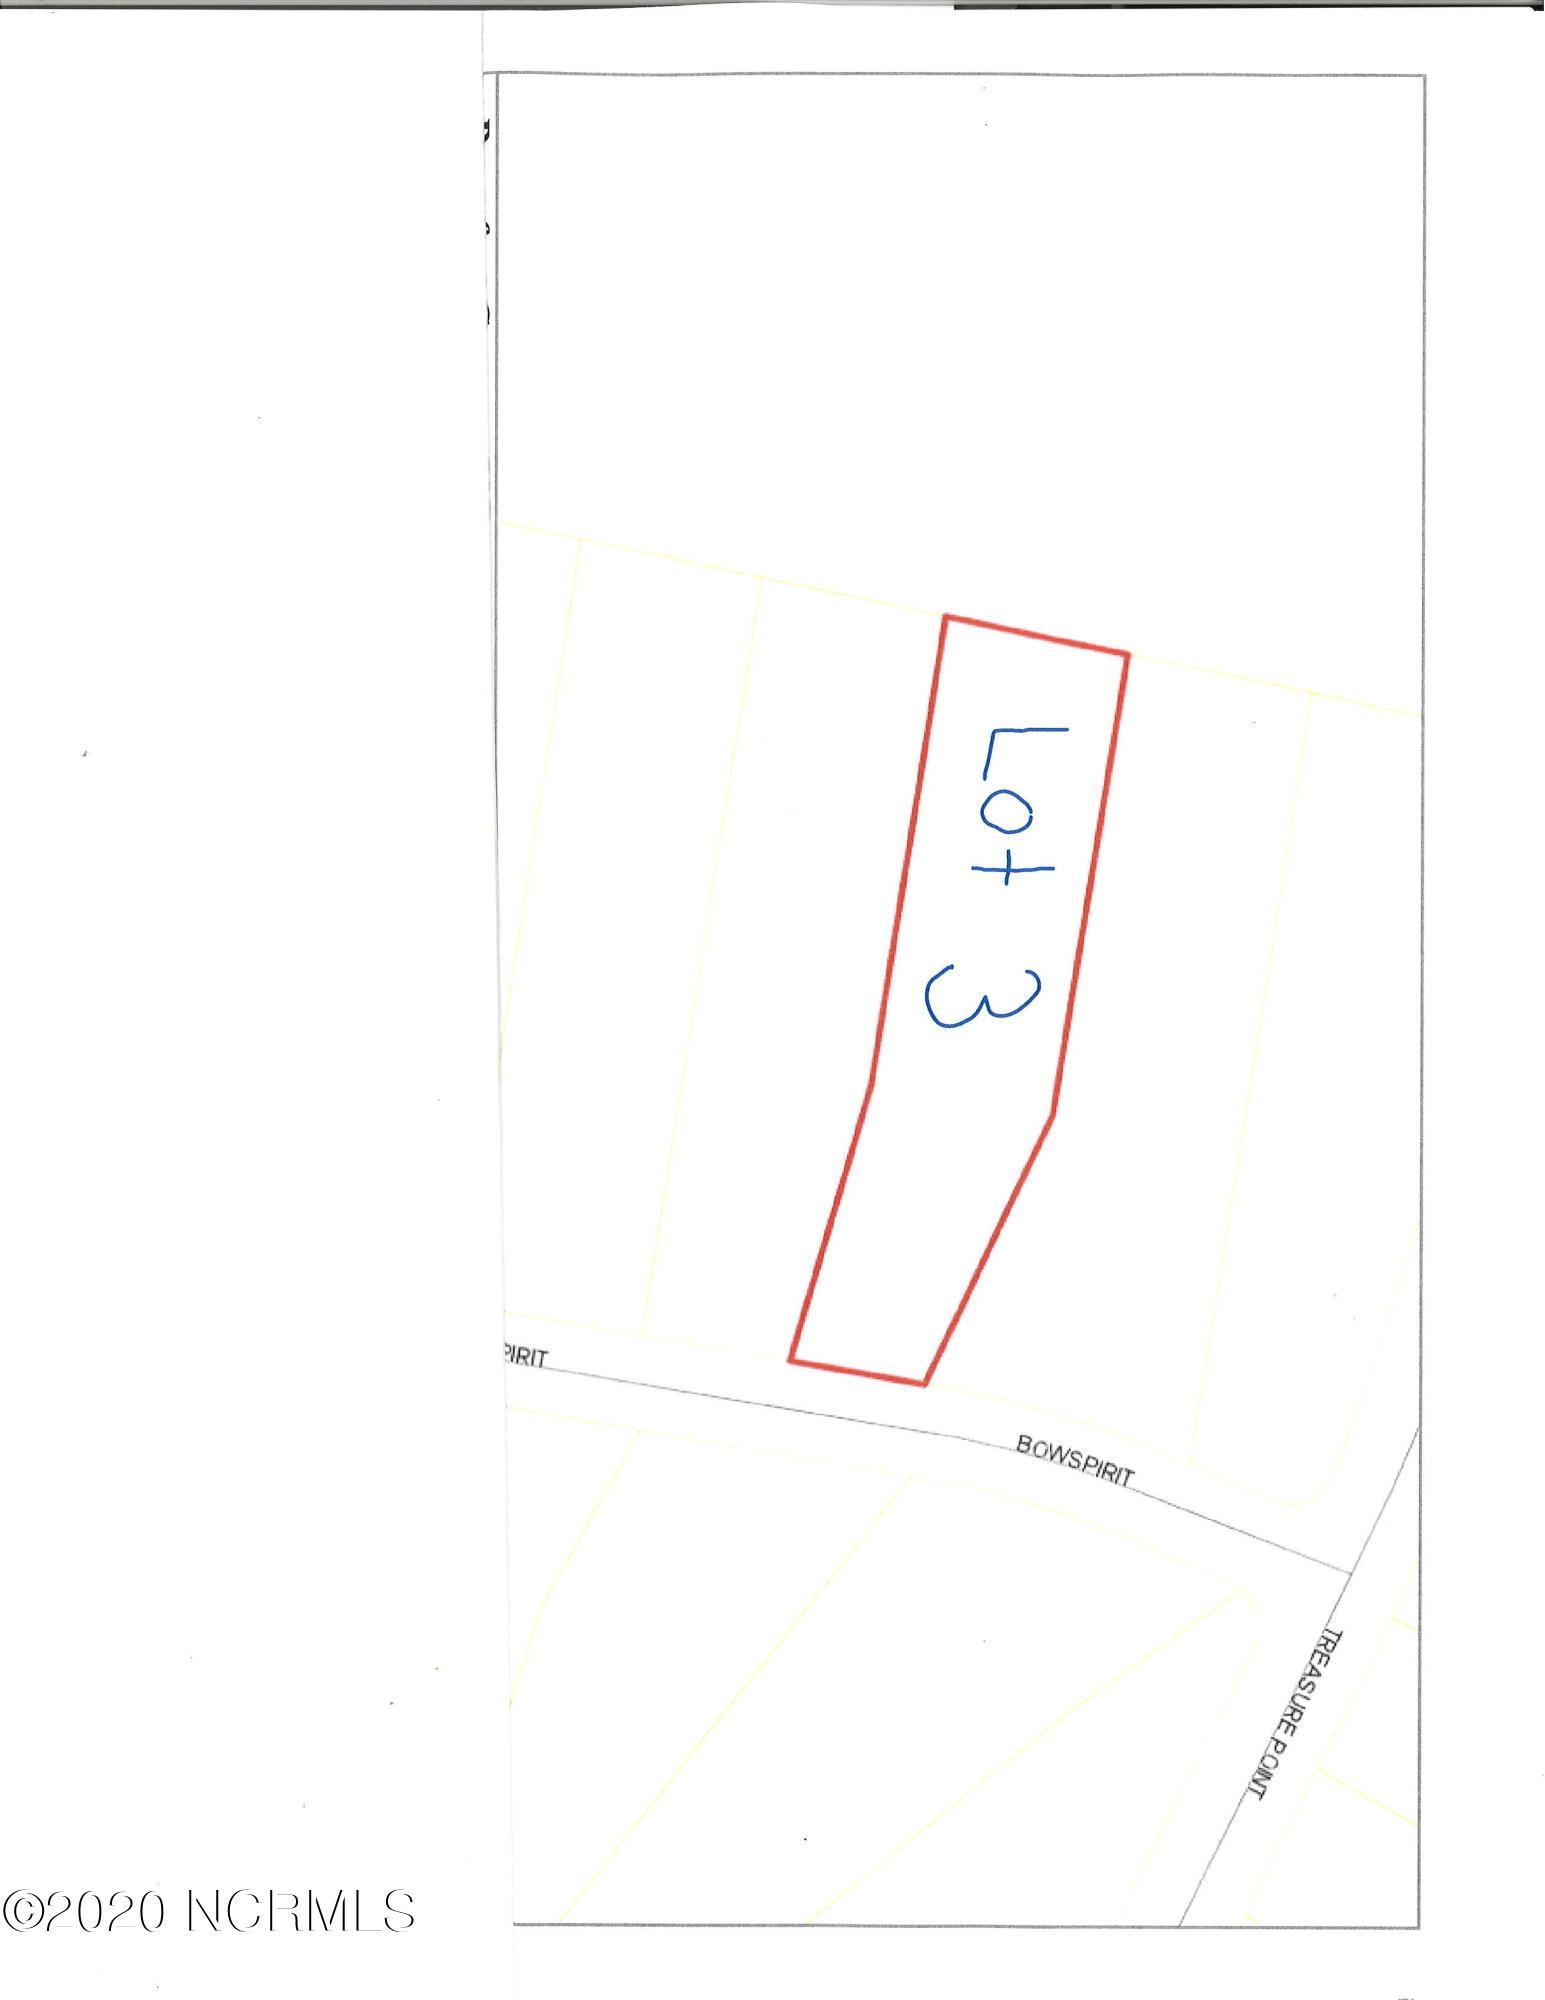 Lot 3 Bowspirit Place, Bath, North Carolina 27808, ,Residential land,For sale,Bowspirit,100249358